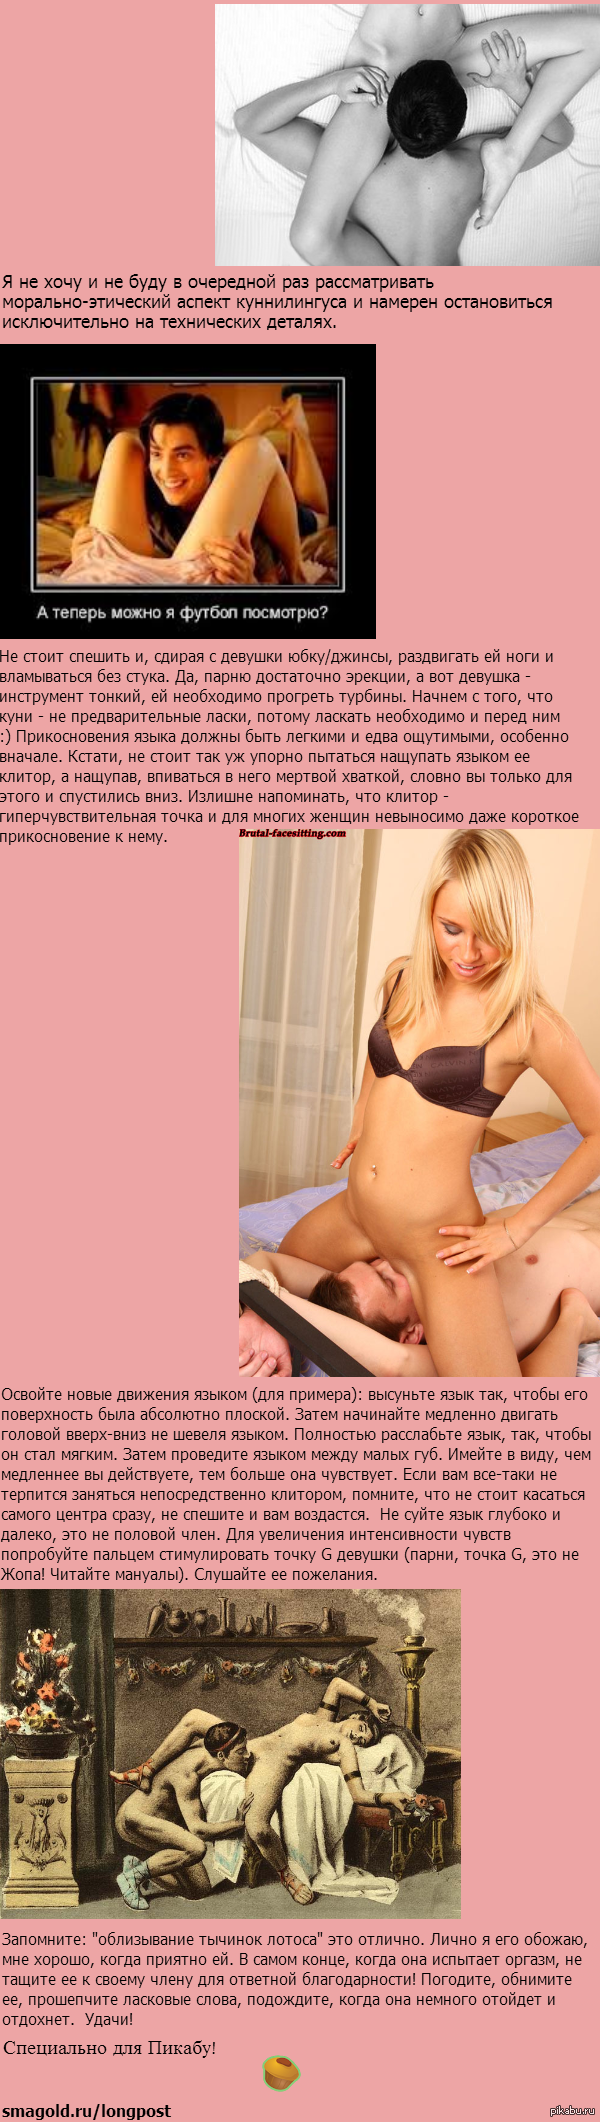 eroticheskie-istorii-kunilingus